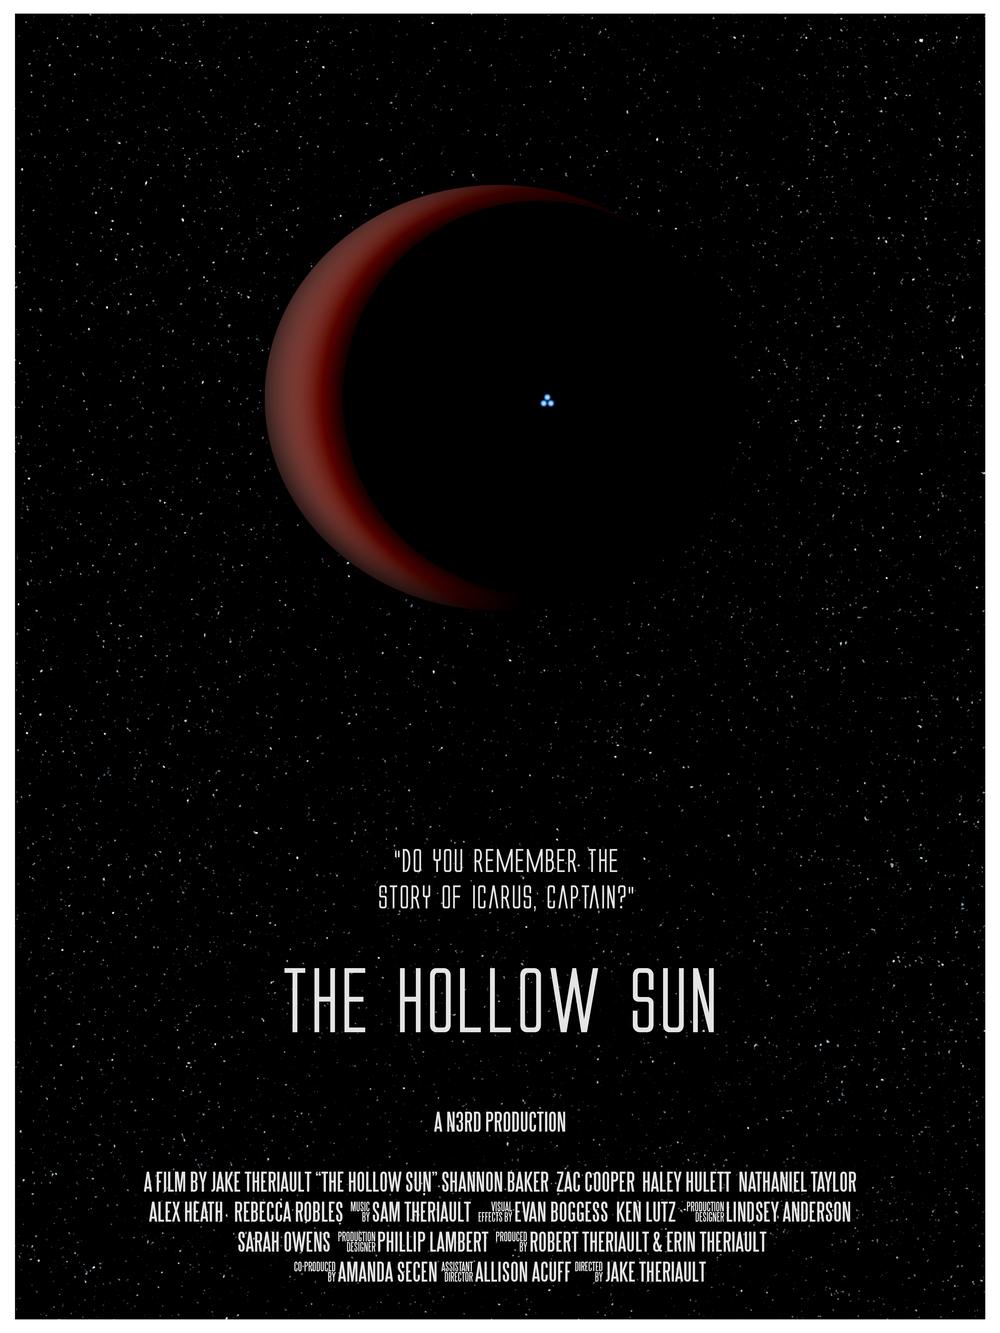 TheHollowSun_Design2.jpg